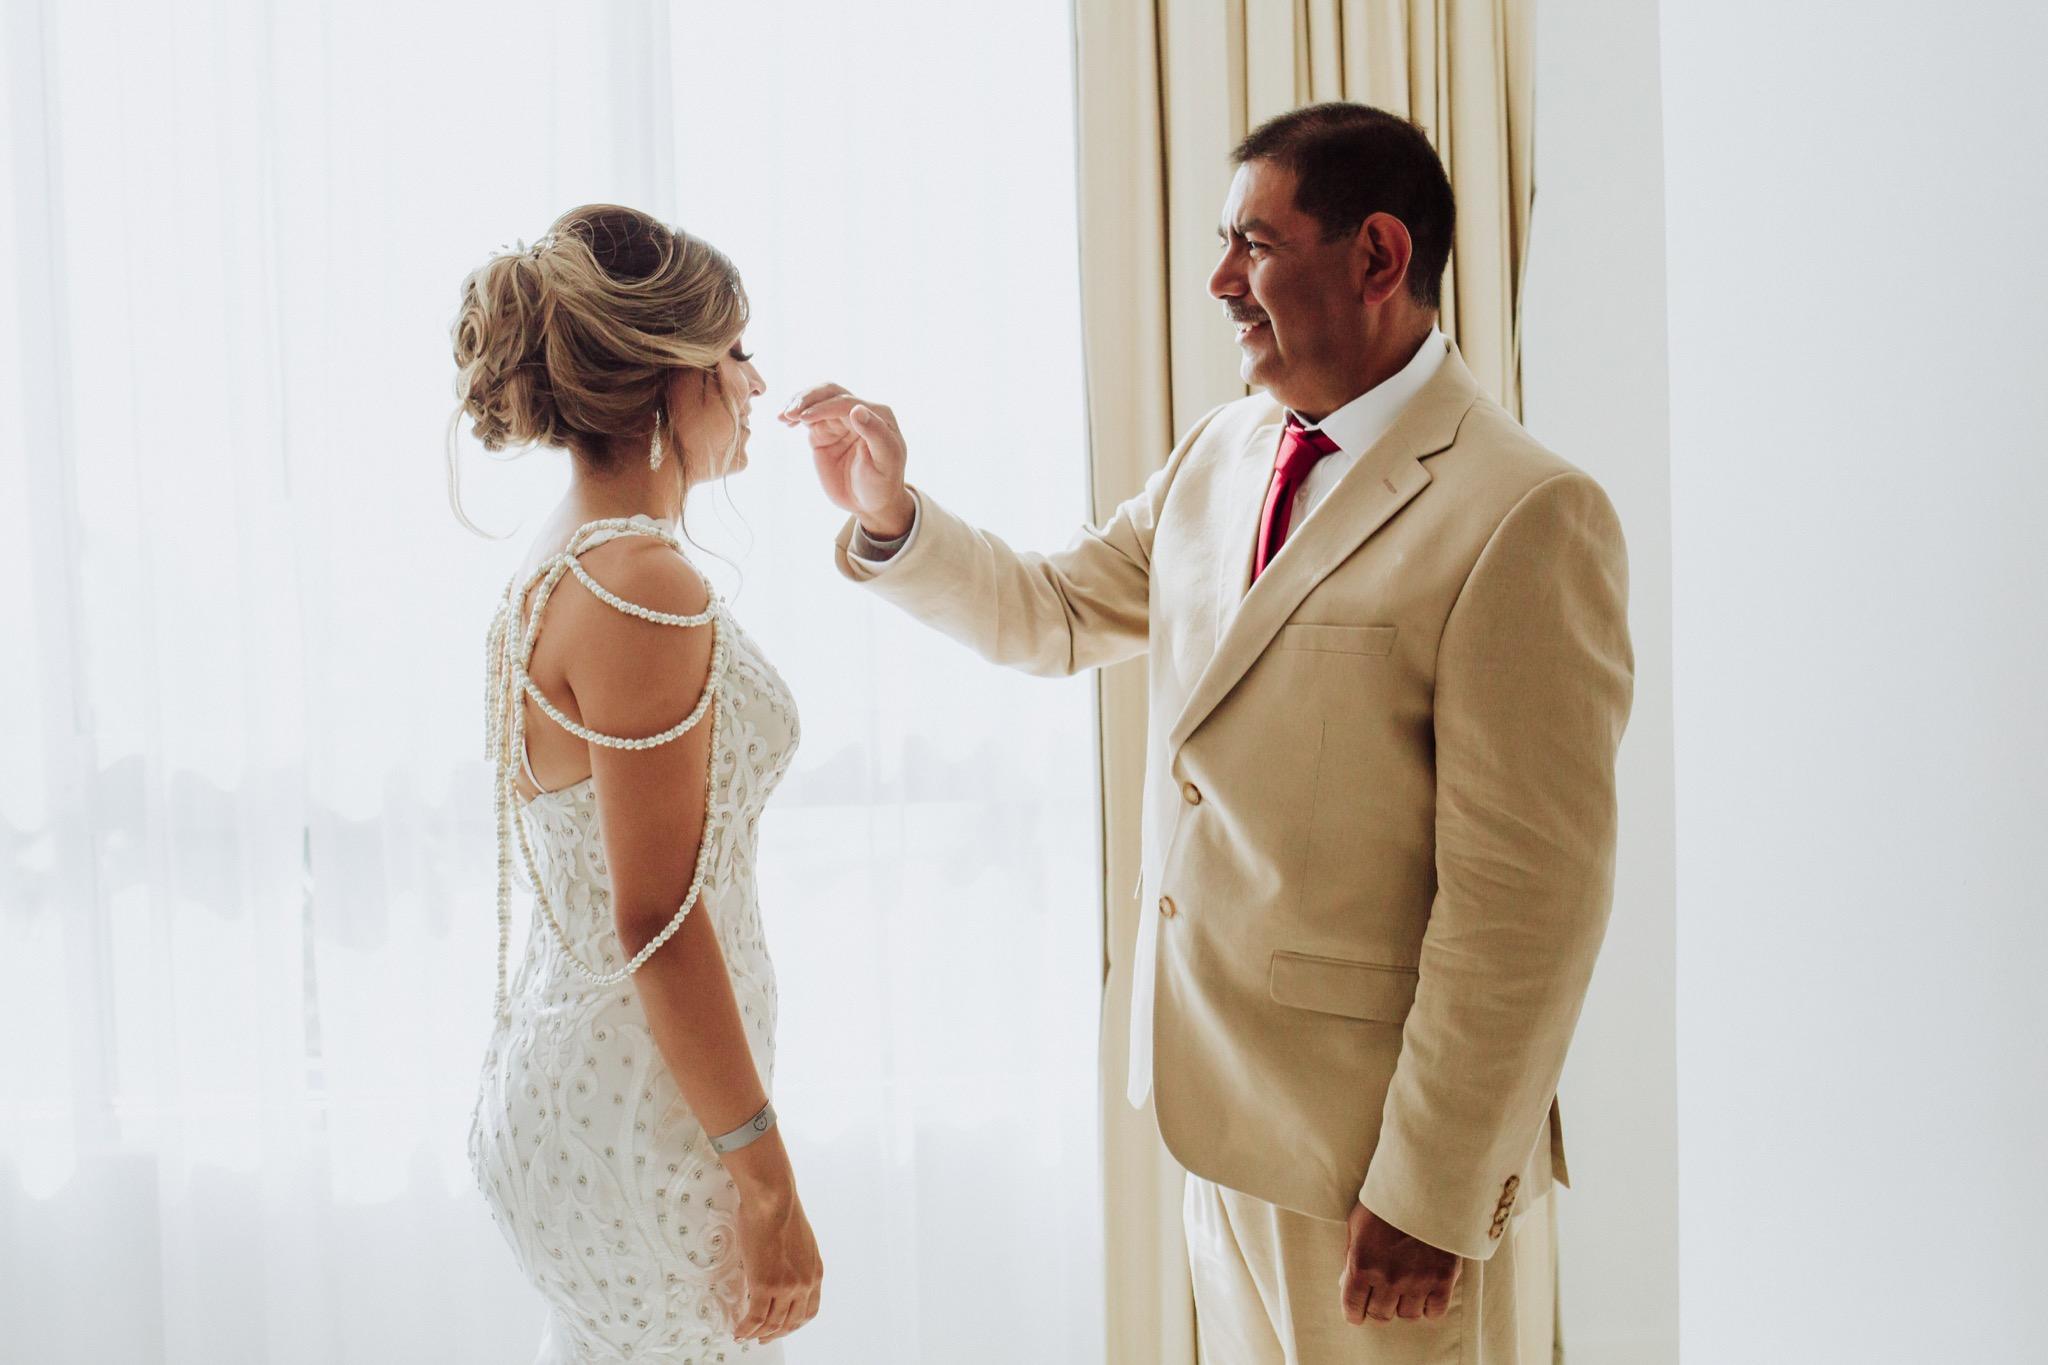 Javier_noriega_fotografo_bodas_profesional_zacatecas_mexico_mazatlan_sinaloa_photographer_weddings14